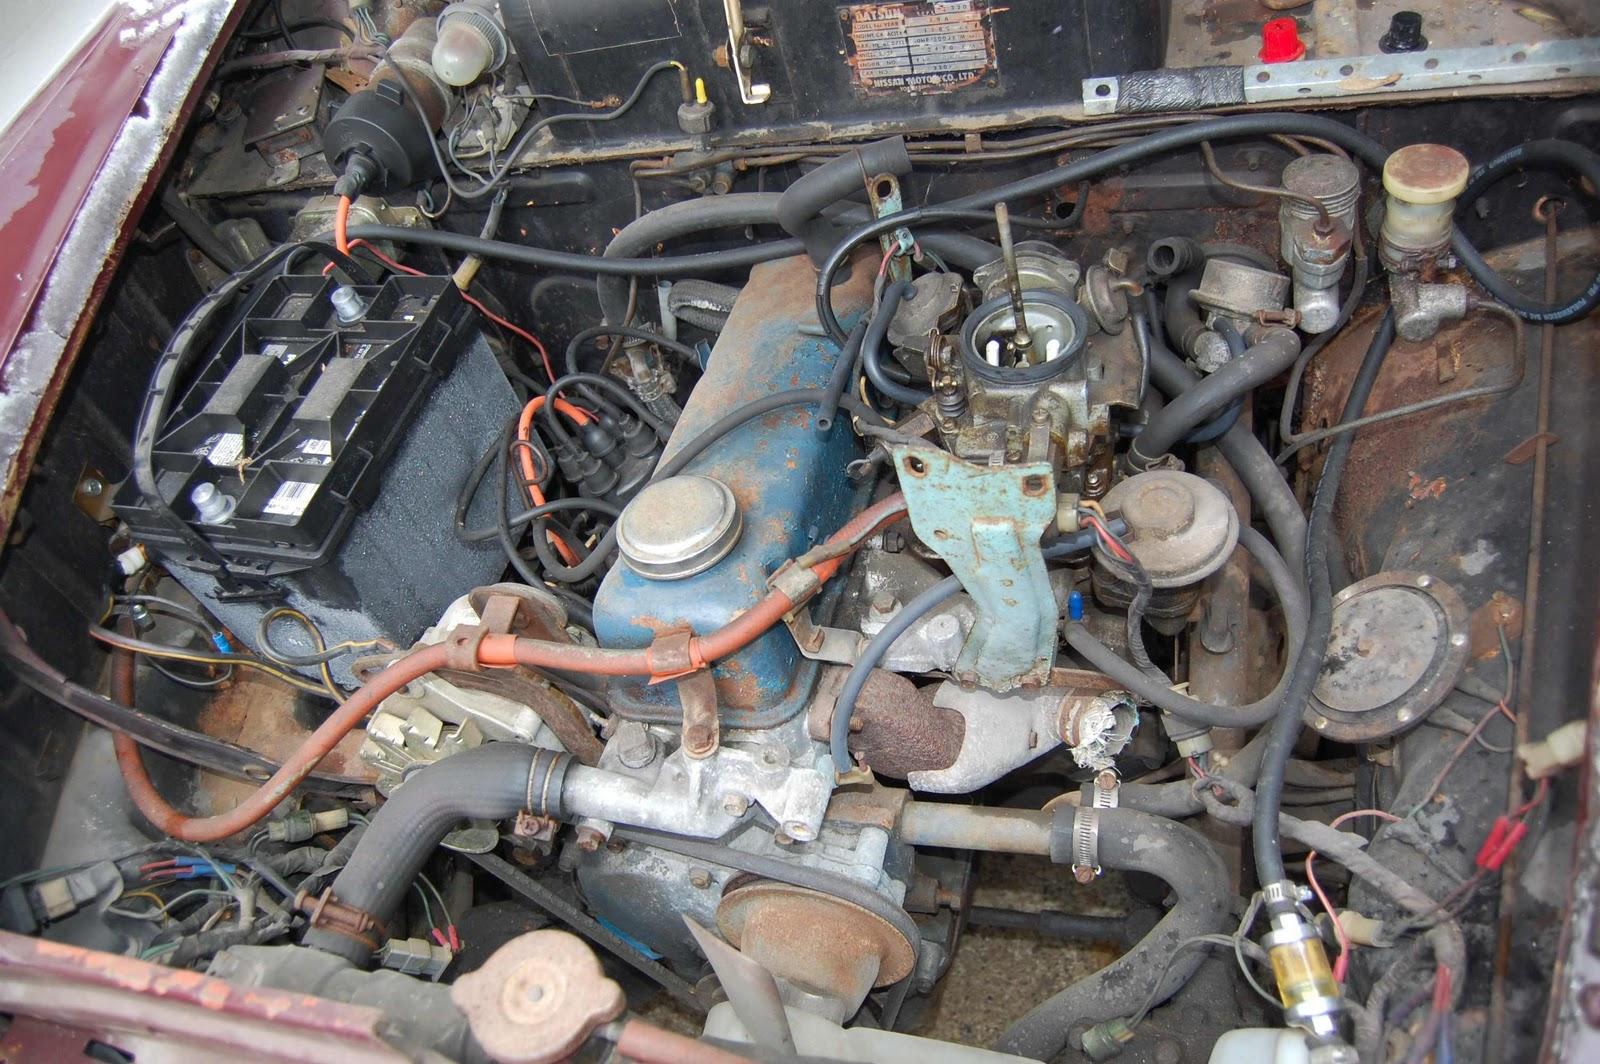 datsun 710 wiring diagram dodge truck wiring diagram 1974 Datsun 620 Wiring-Diagram 1983 Datsun 720 Wiring-Diagram